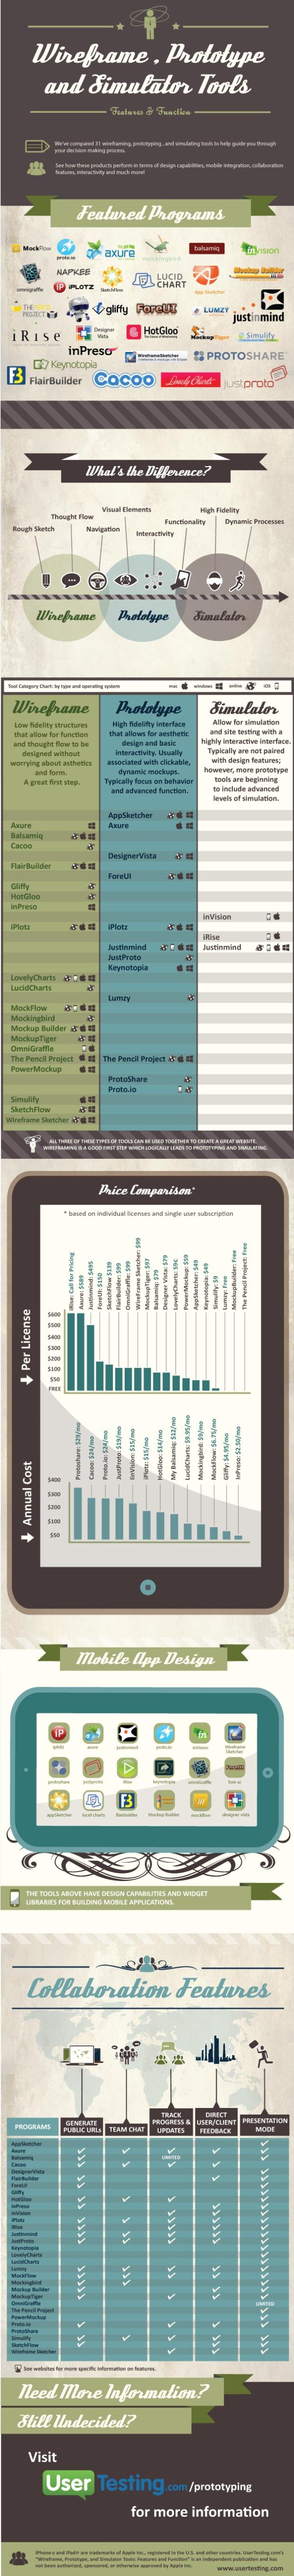 prototyping-infographic